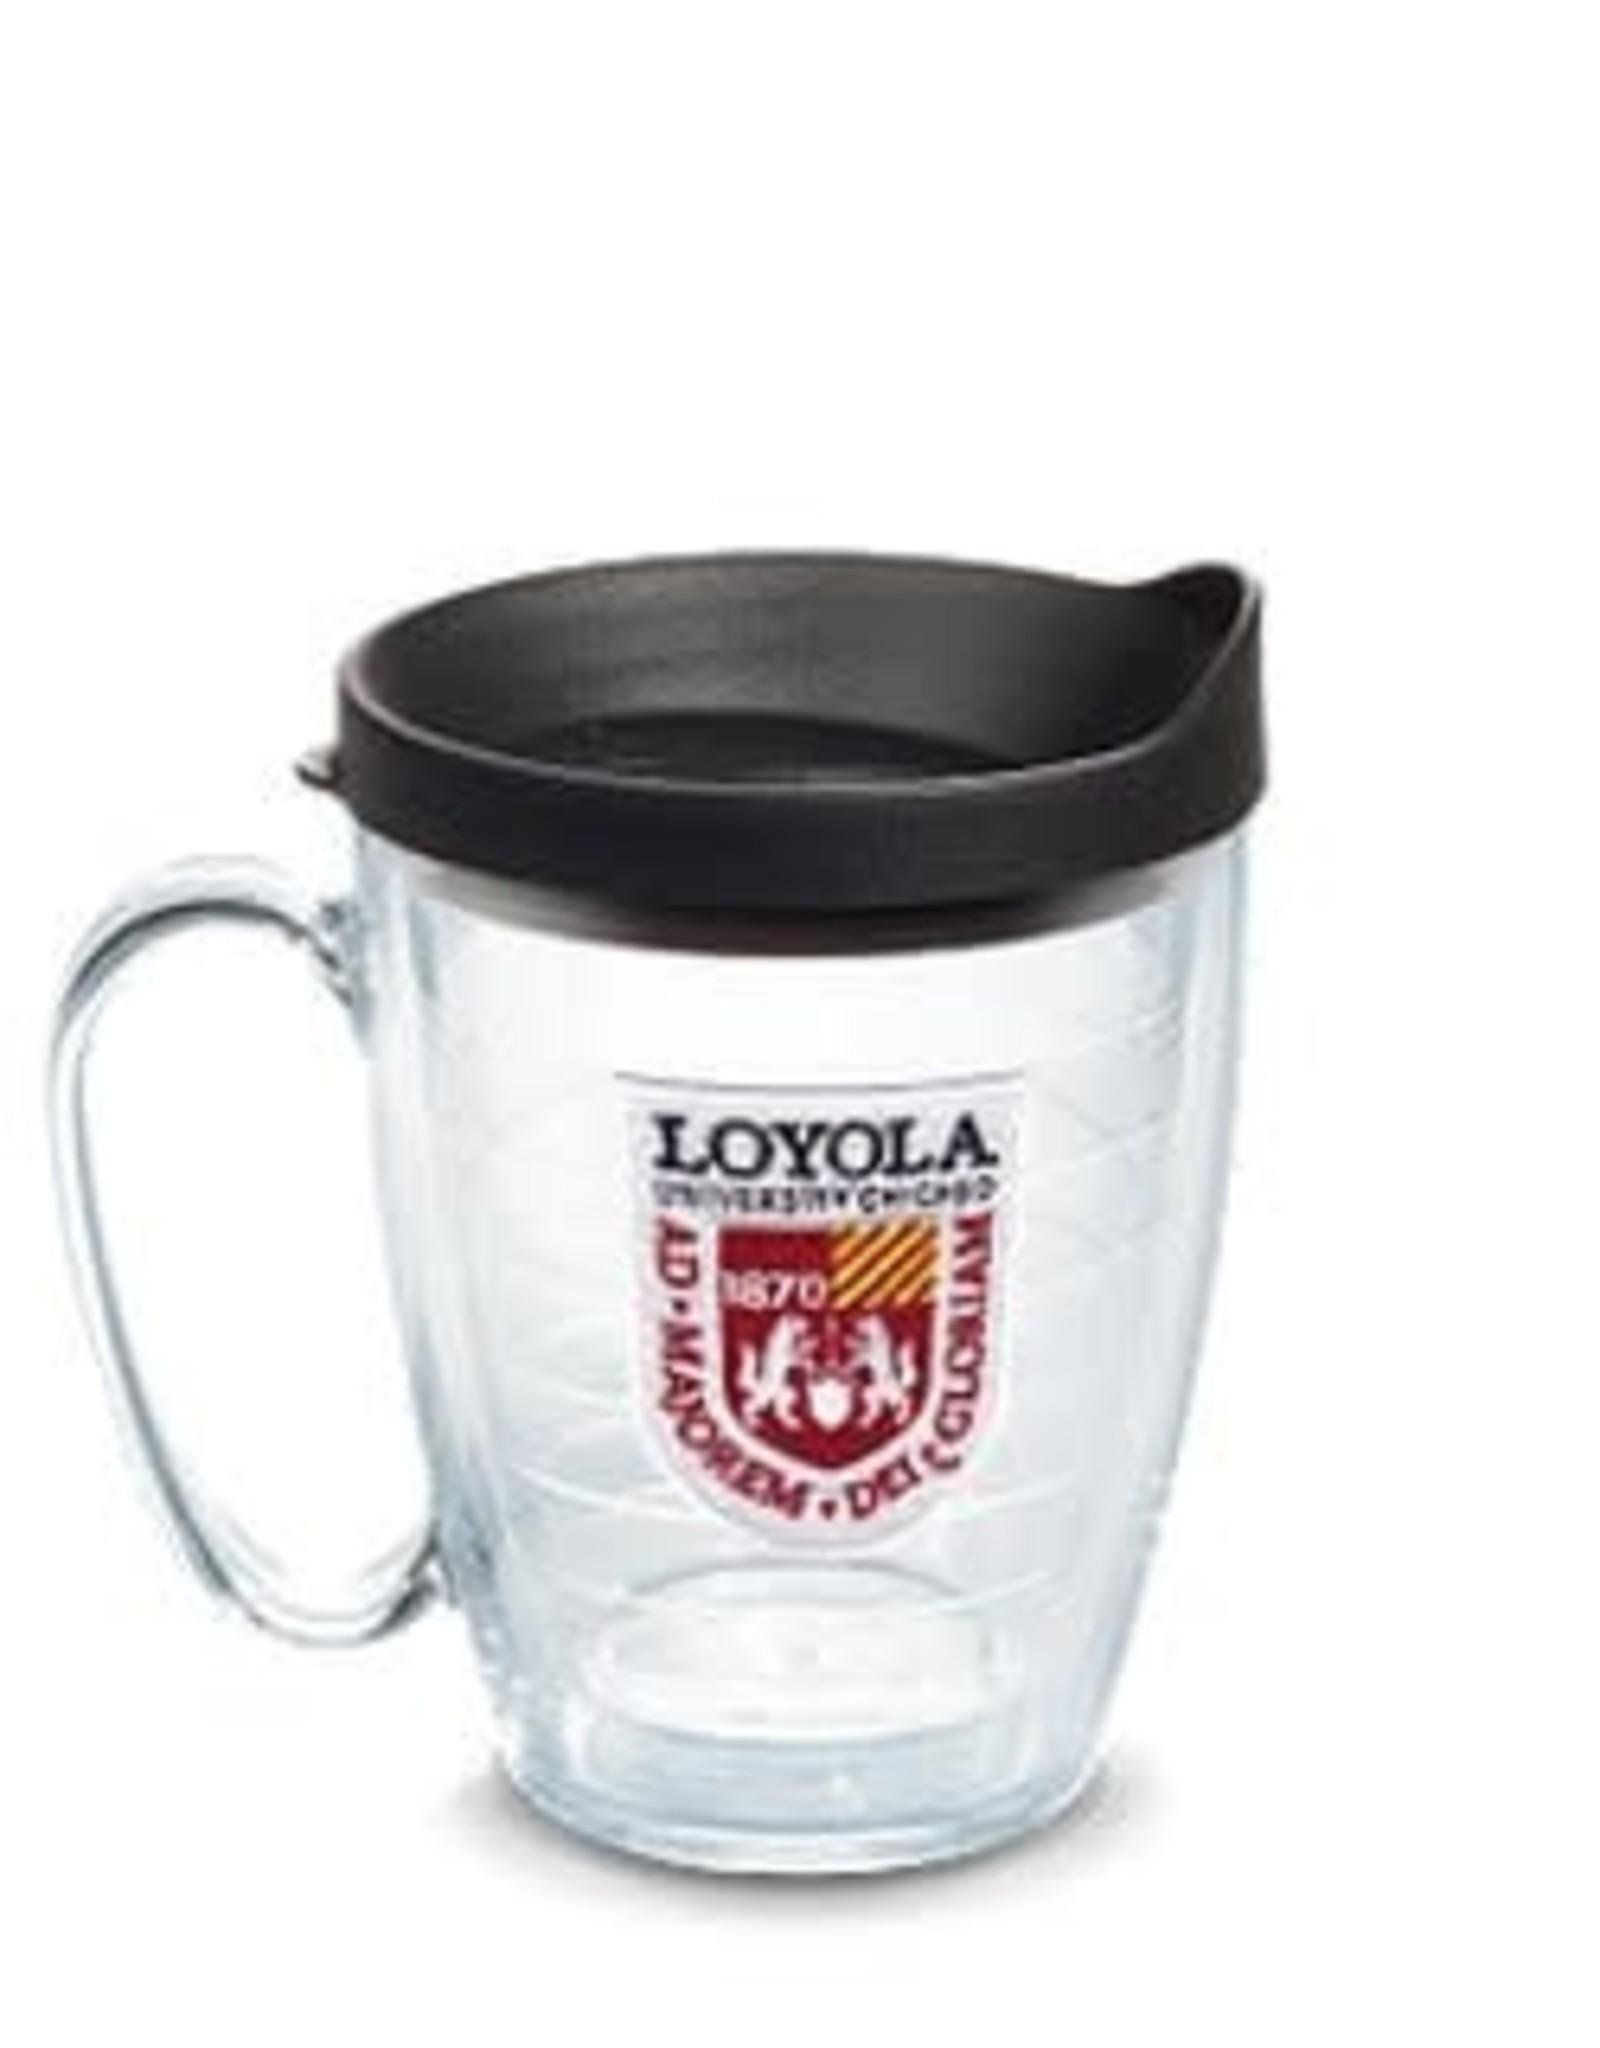 Tervis Tumbler 15 oz Mug/Lid Loyola